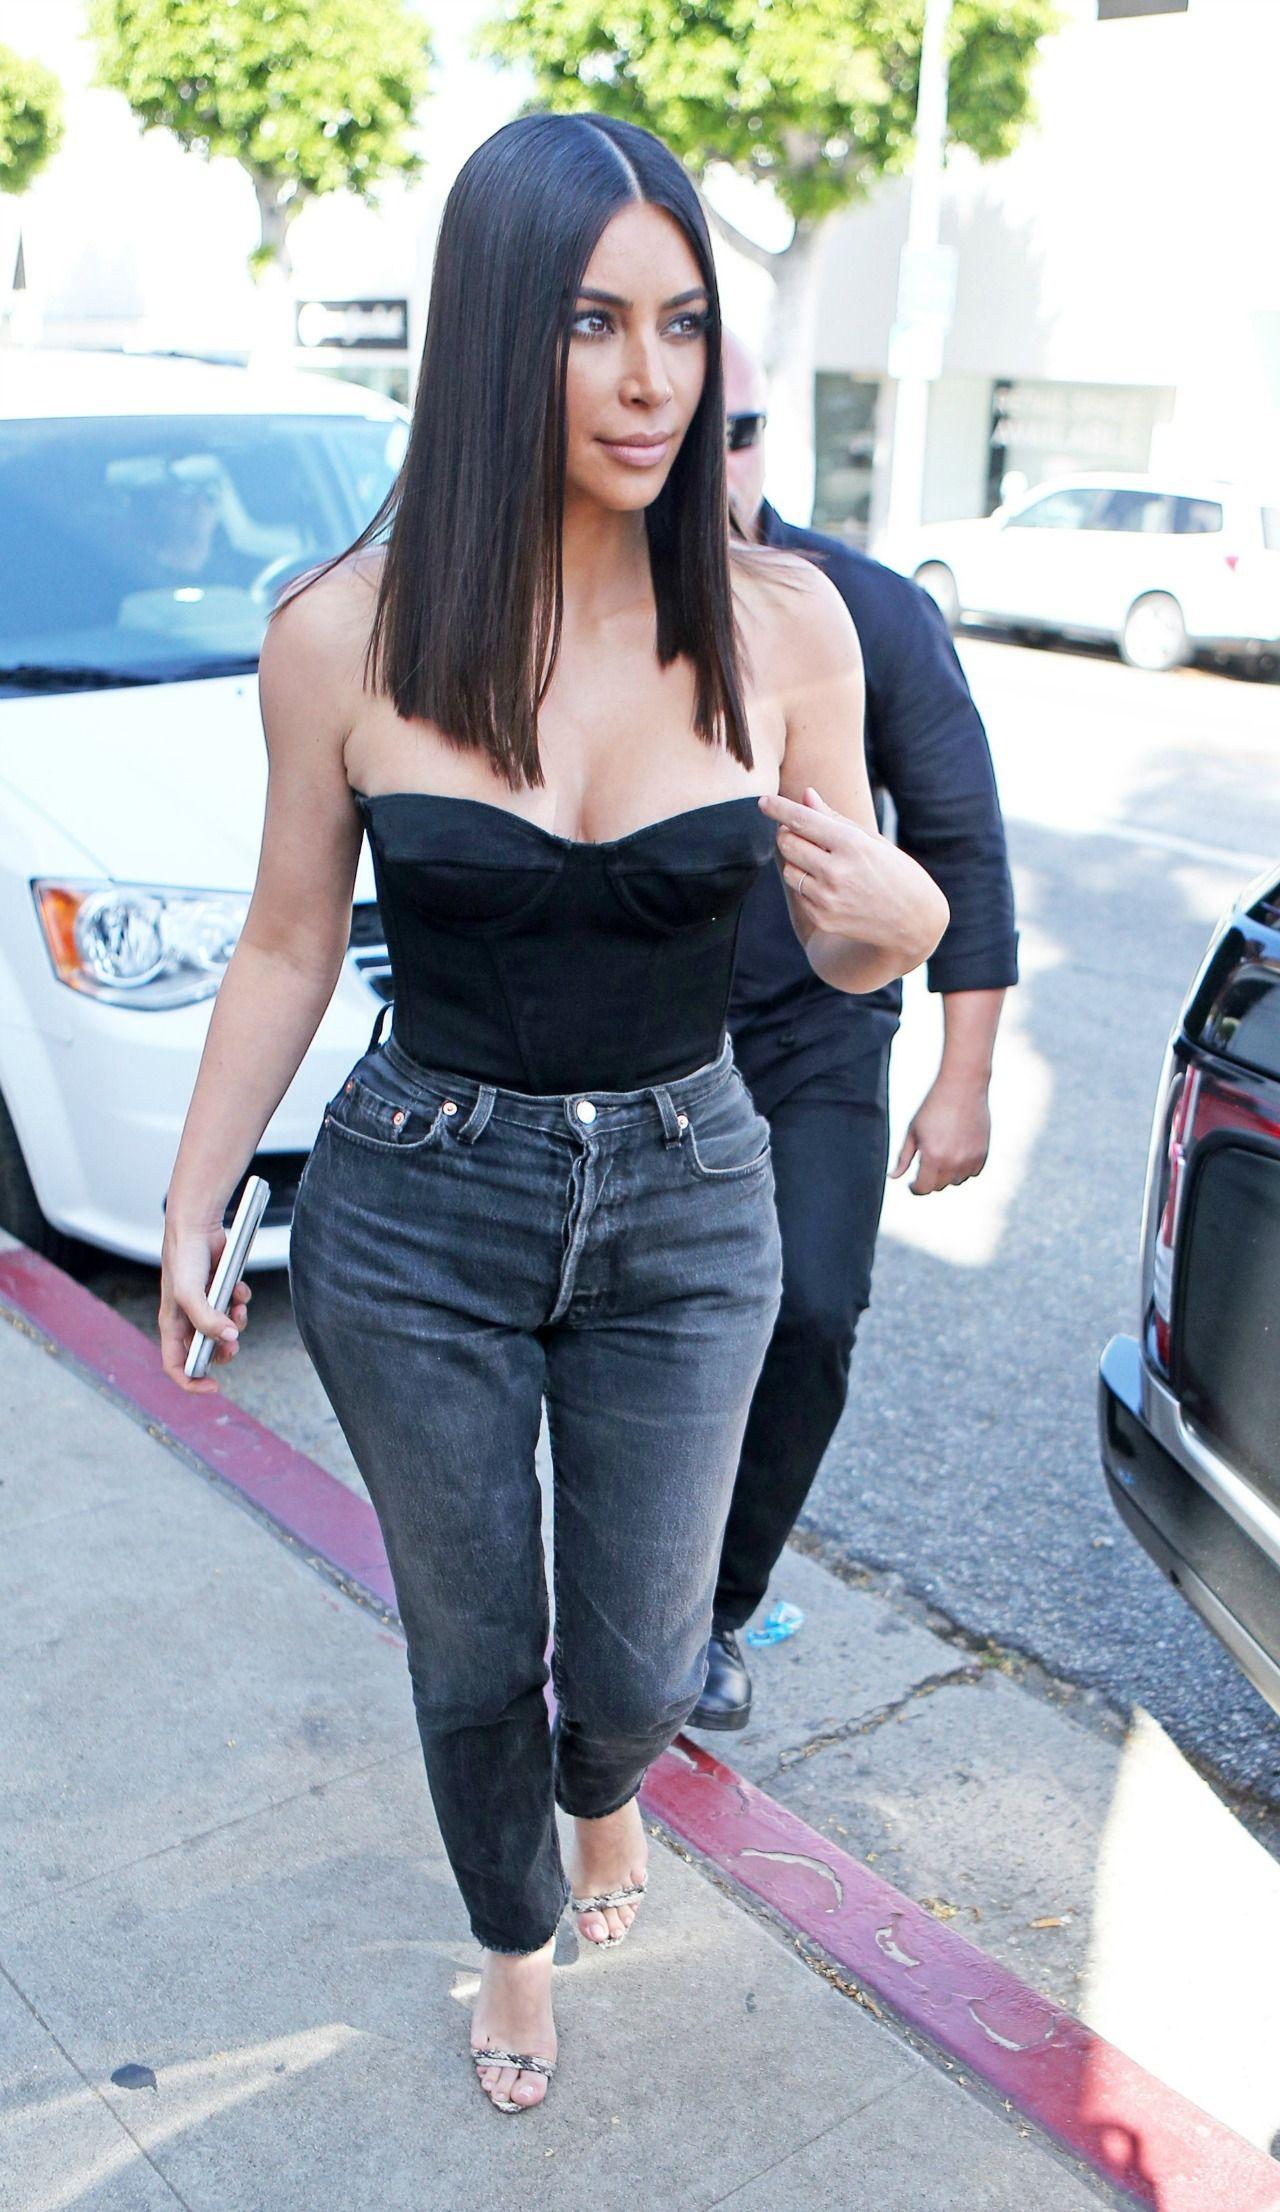 Kim Kardashian Chopped Her Hair Off—And It Looks AMAZING Kim Kardashian Chopped Her Hair Off—And It Looks AMAZING new images